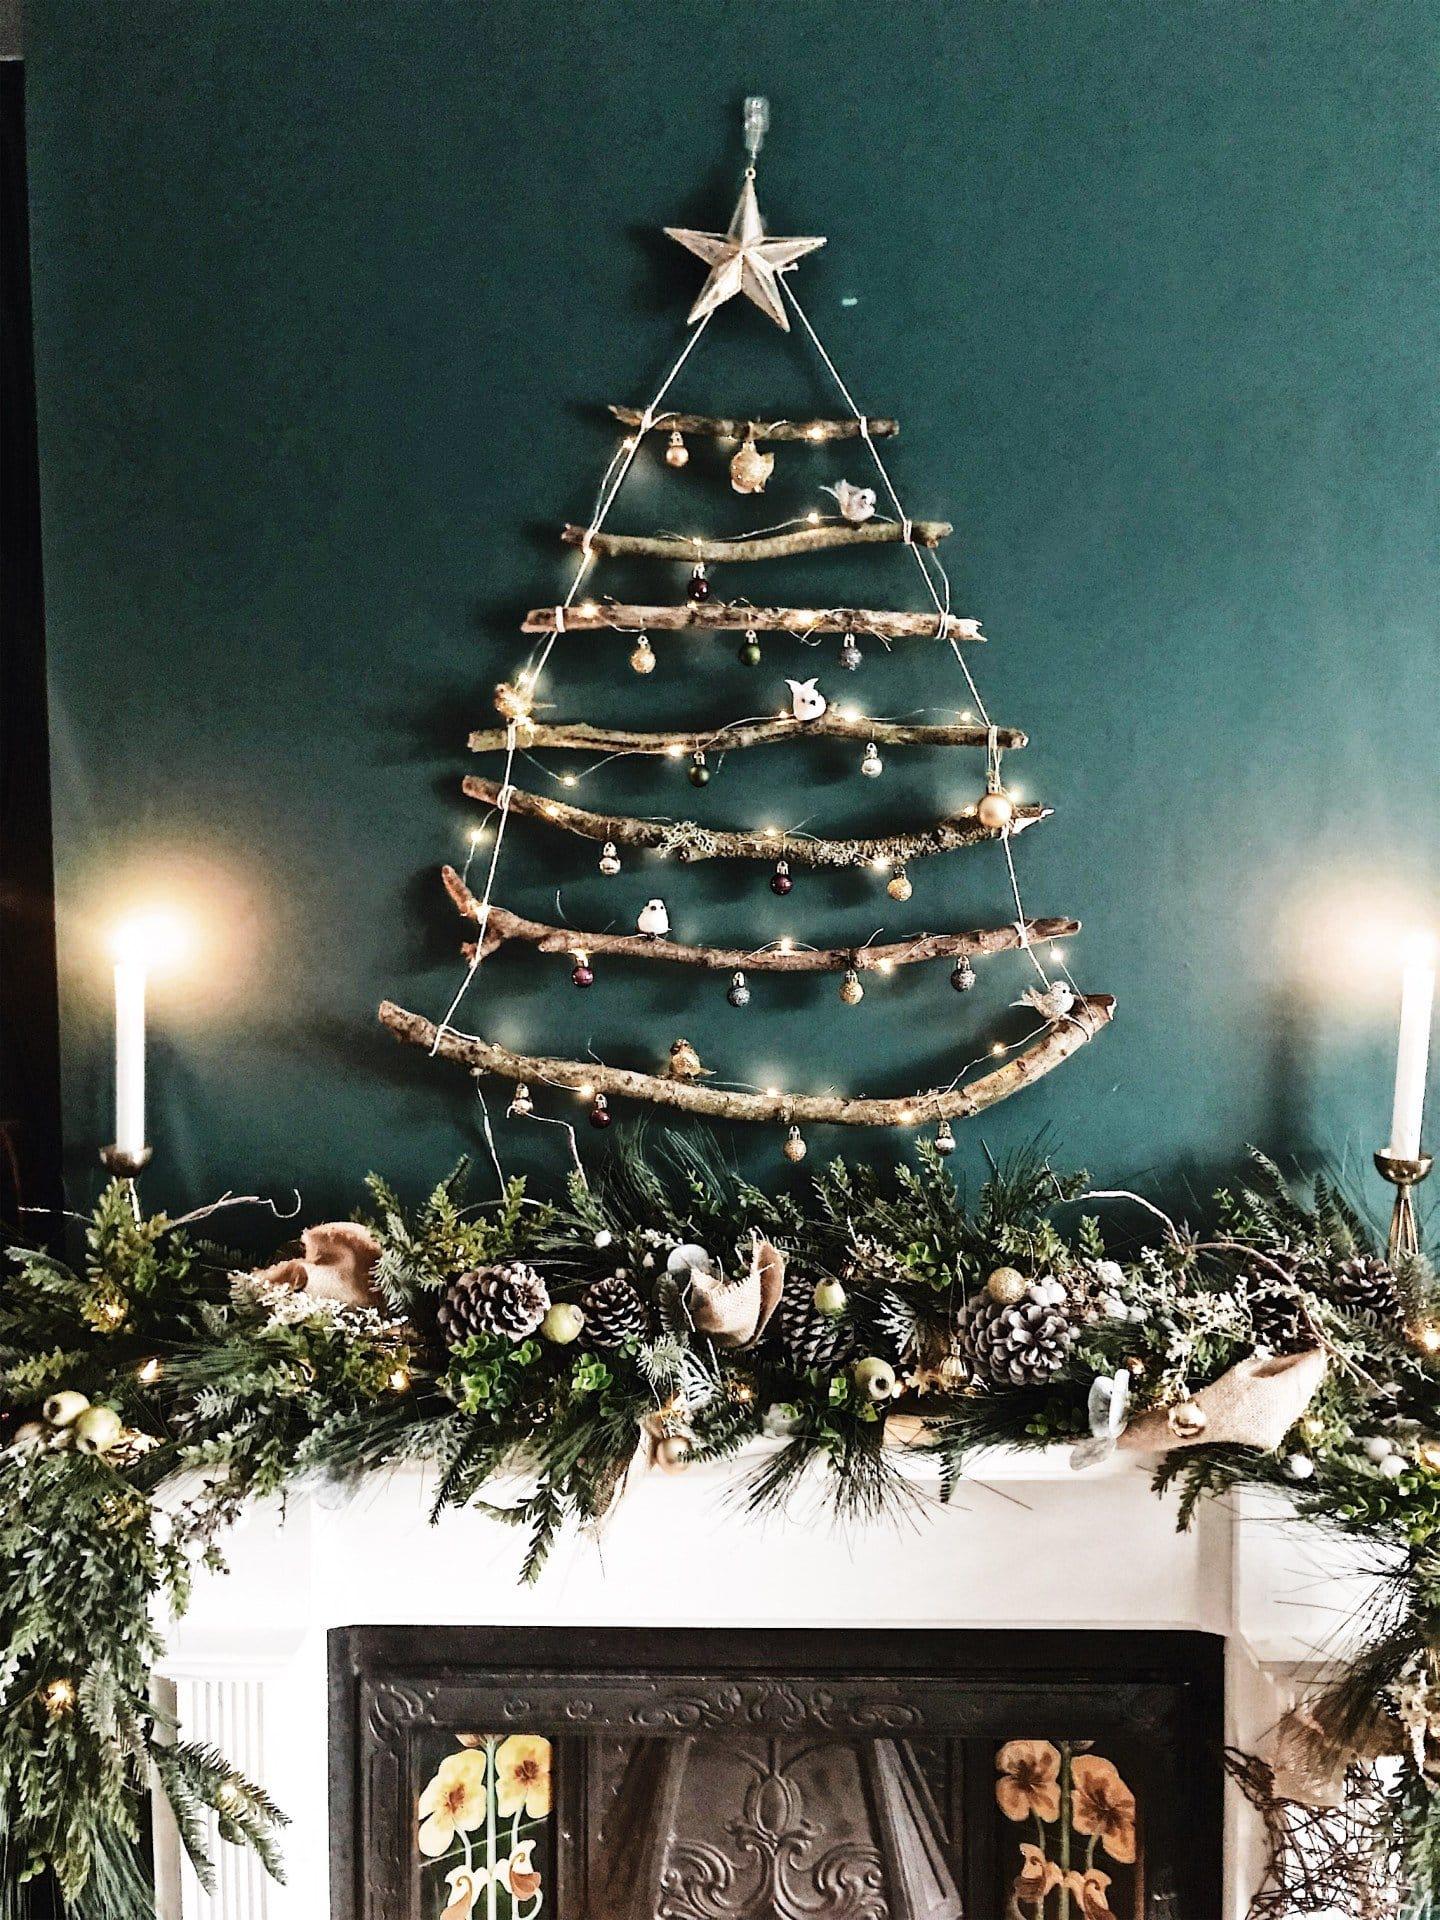 Christmas, christmas crafts, diy, christmas diy, crafts, decor, christmas decorations, christmas decor, decorations, rustic decor, diy decor, home decor, seasonal decor